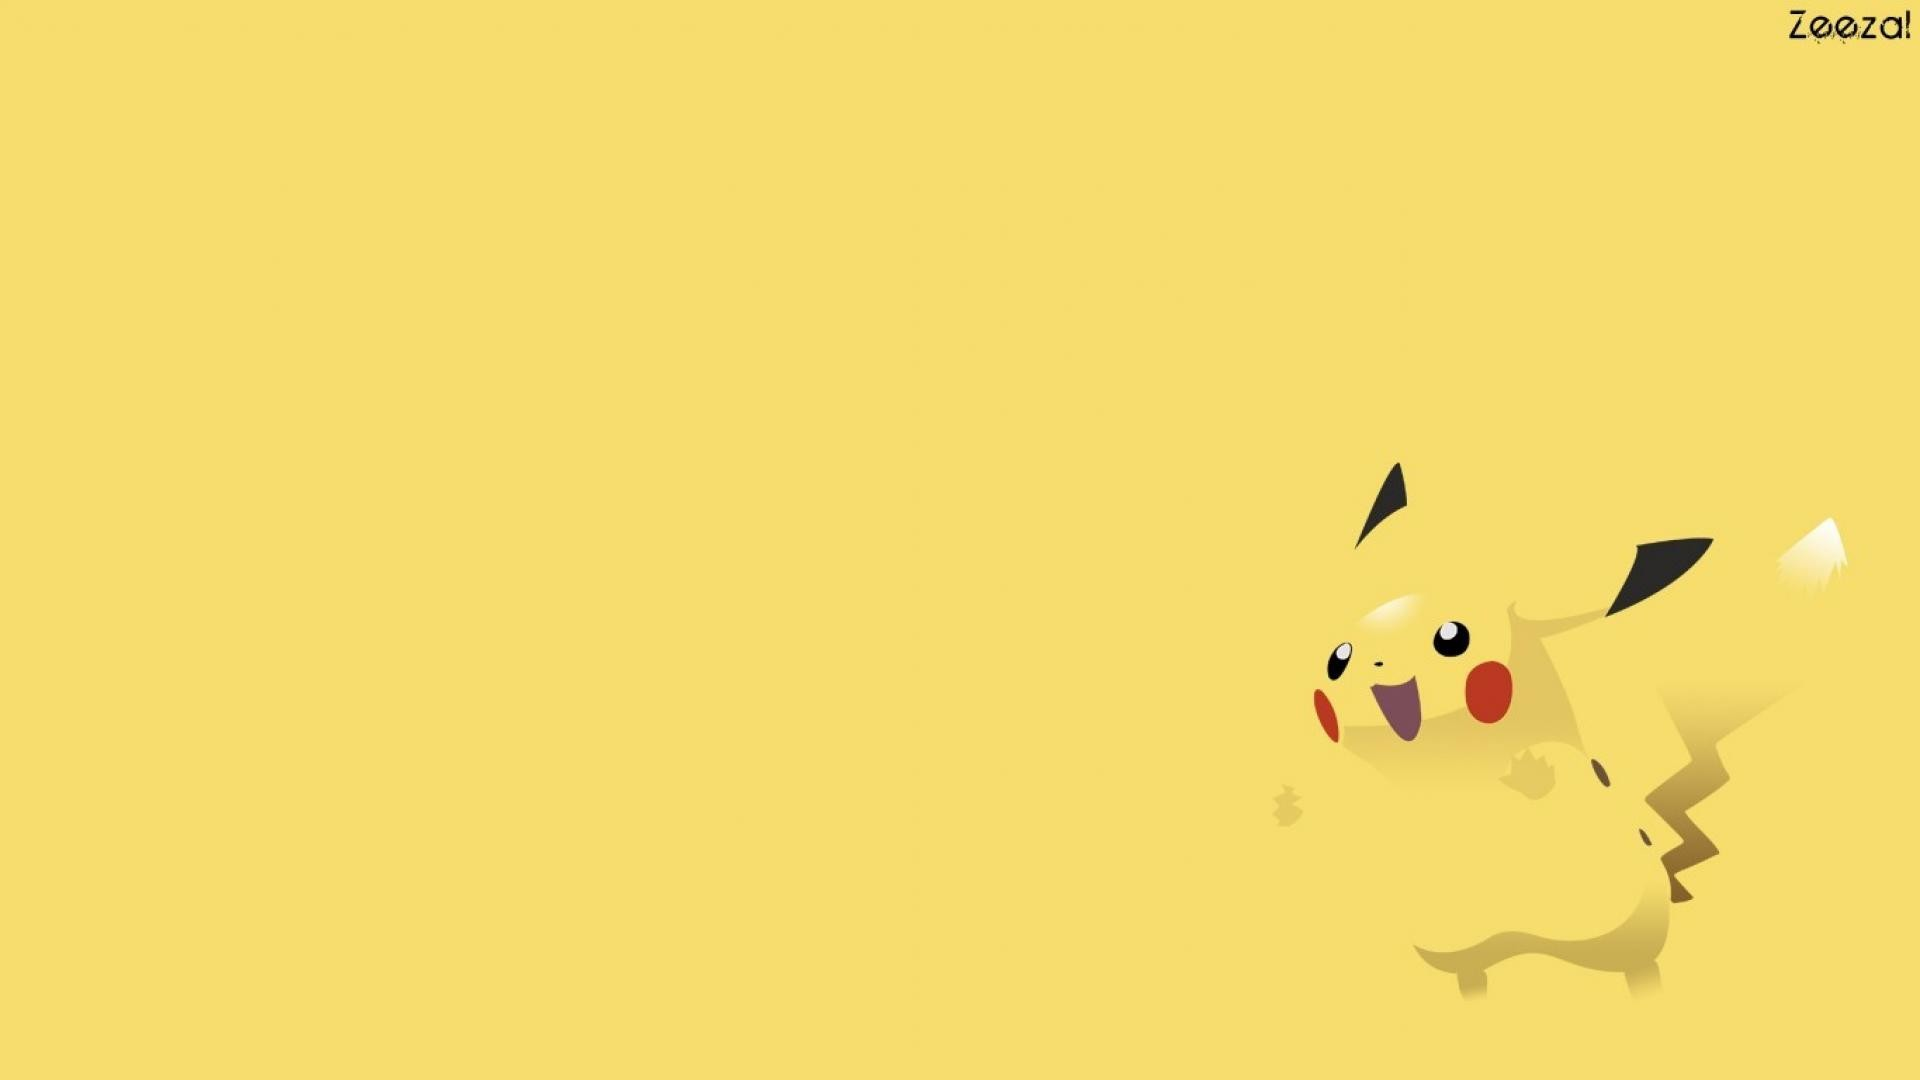 Pokemon minimalistic pikachu wallpaper | (9129)